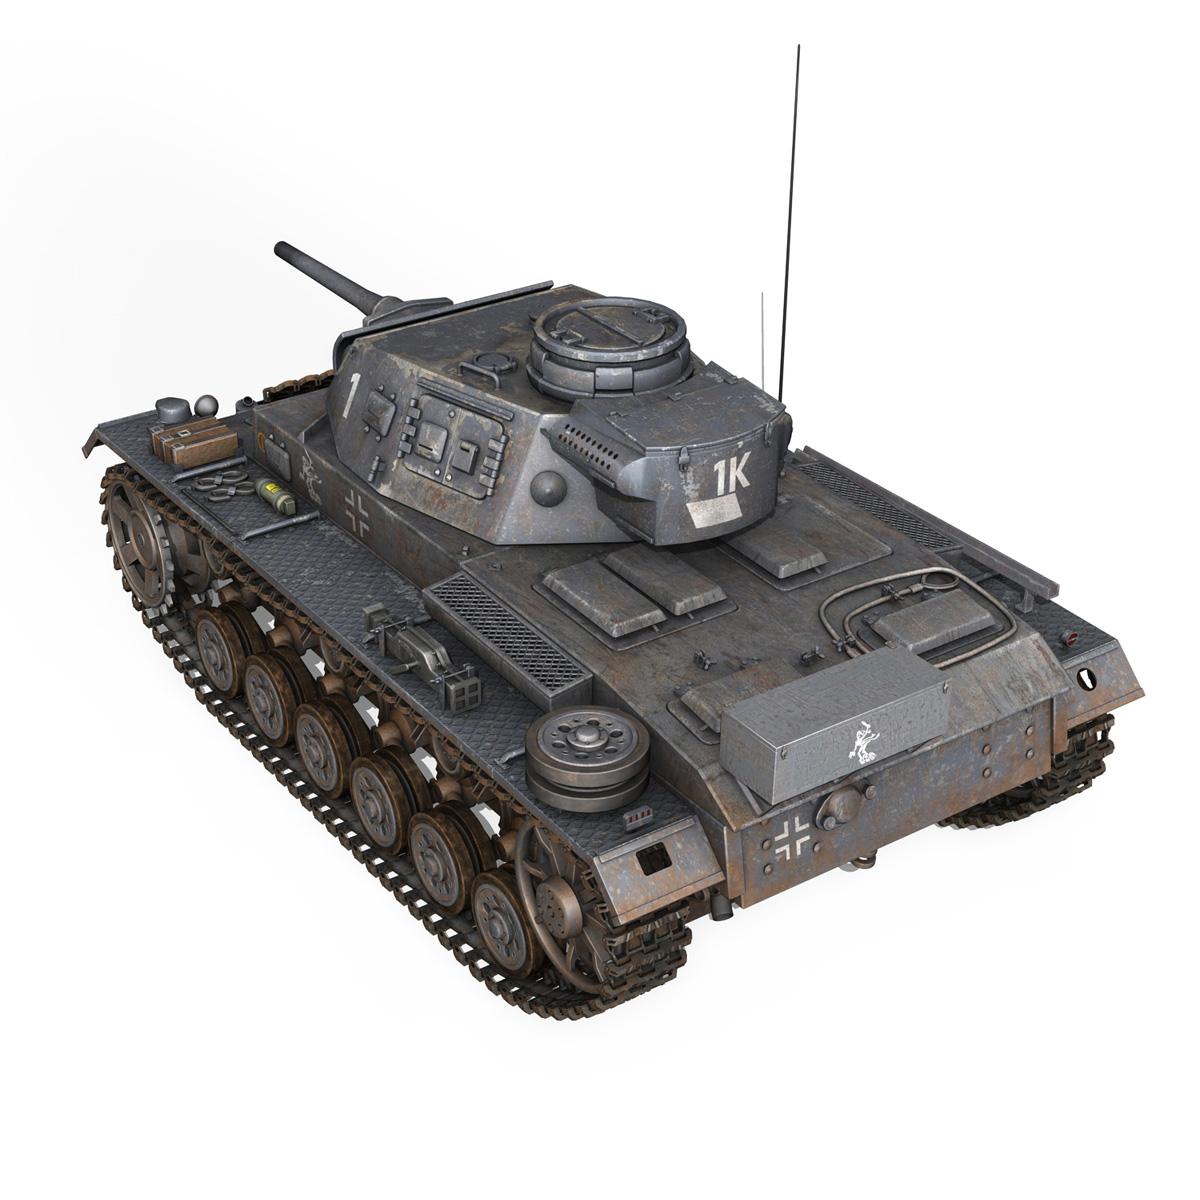 pzkpfw iii – panzer 3 – ausf.j – 1k 3d model lwo lw lws obj c4d 3ds fbx 266448